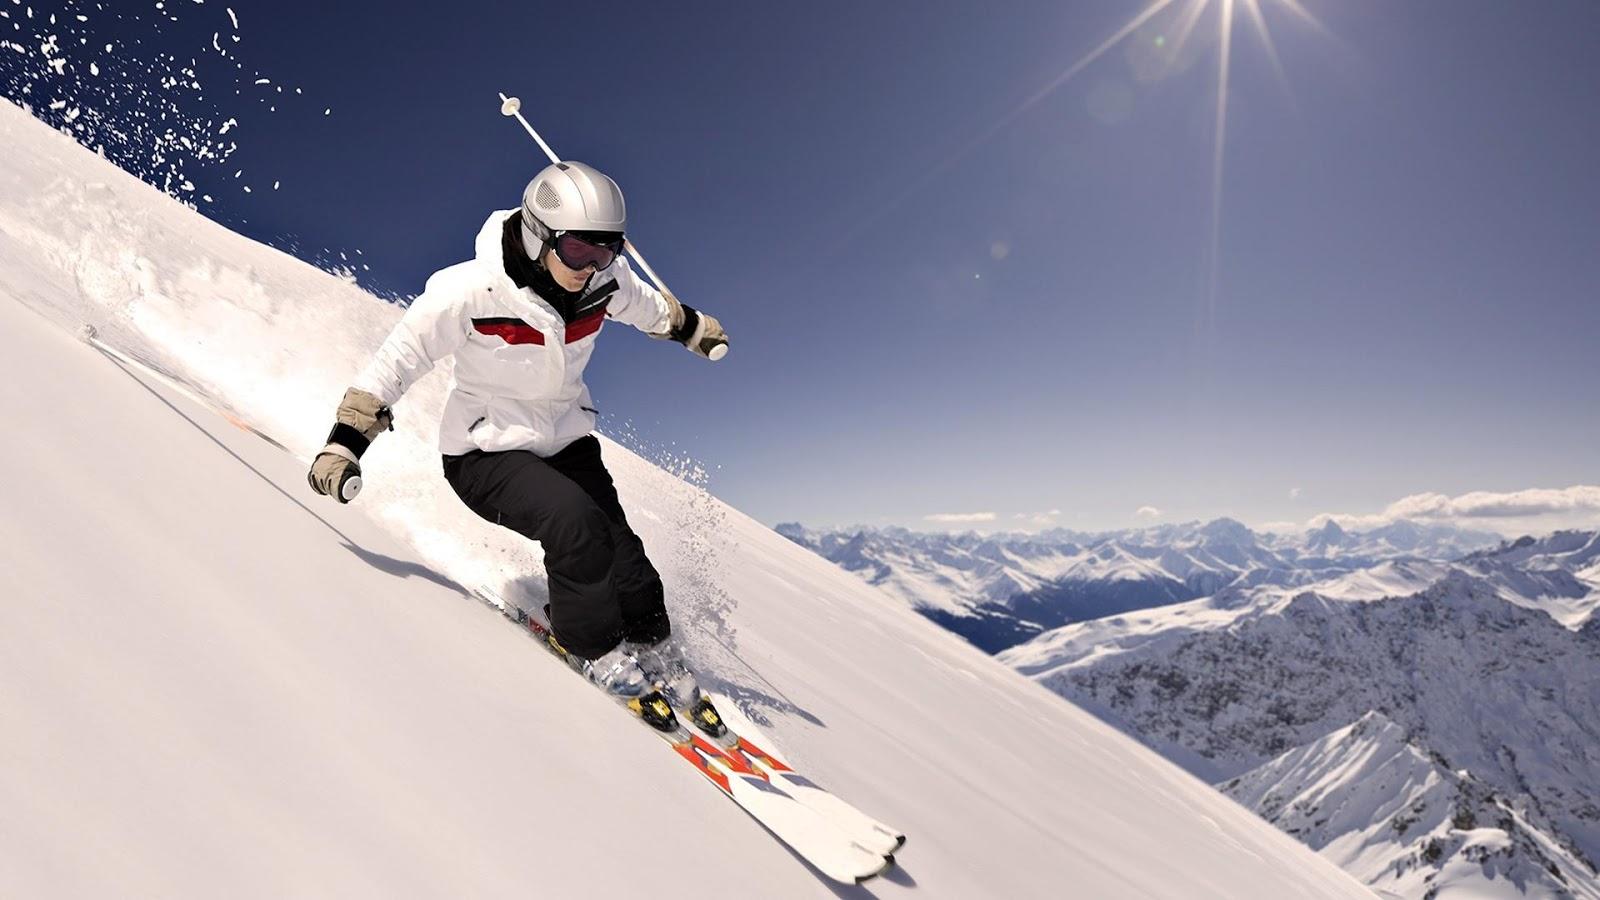 2bpblogspot H M8WdfUTSM Ski Wallpaper